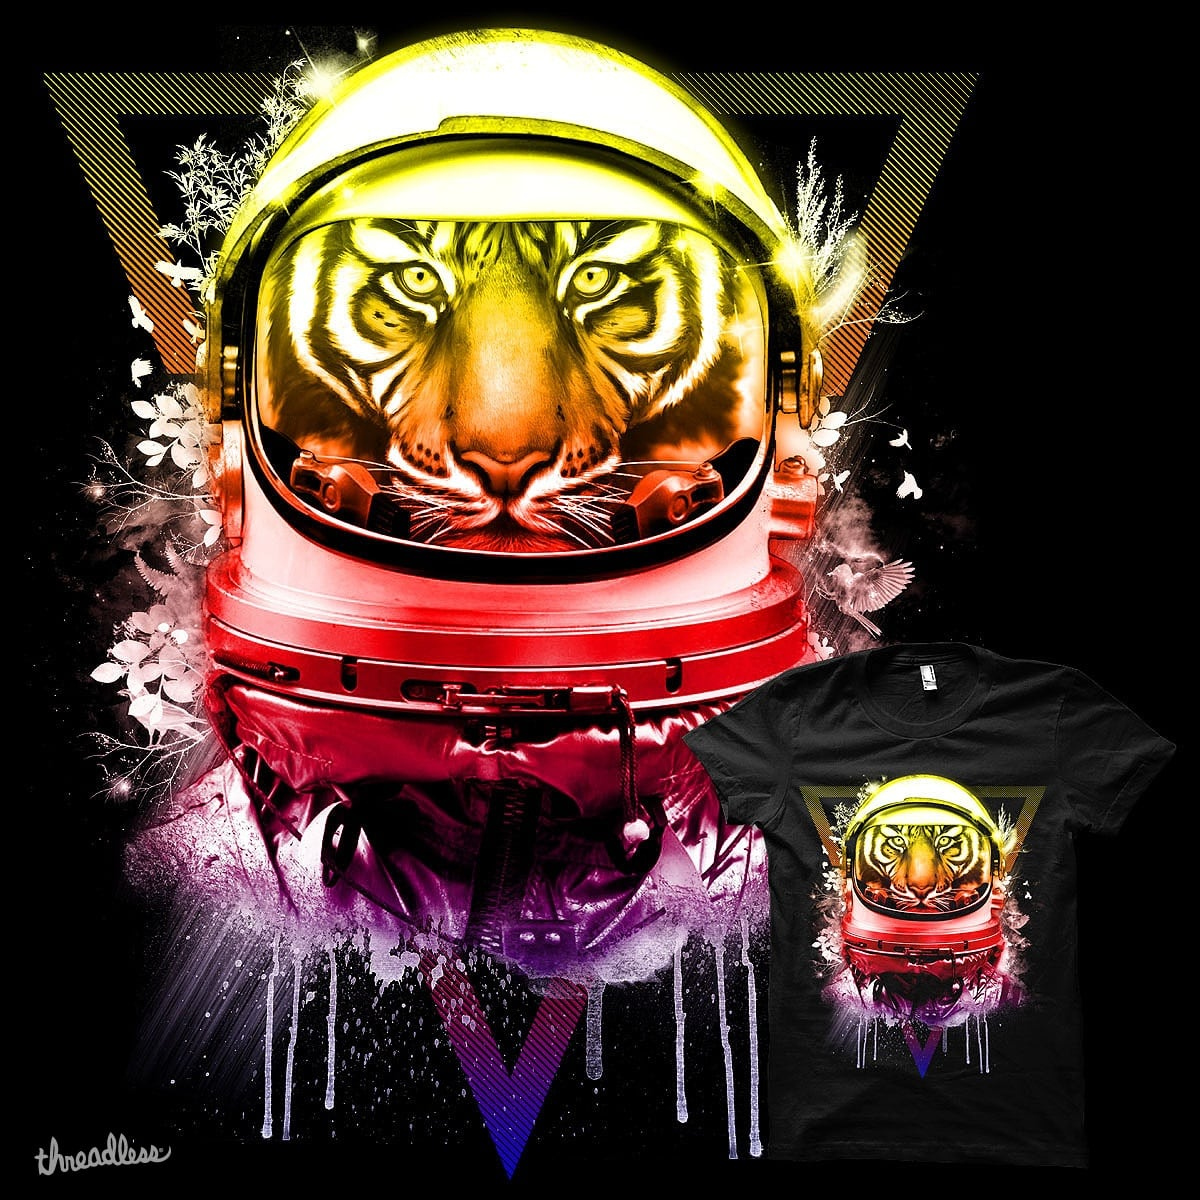 Astro Tiger by Agimat ni Ingkong on Threadless